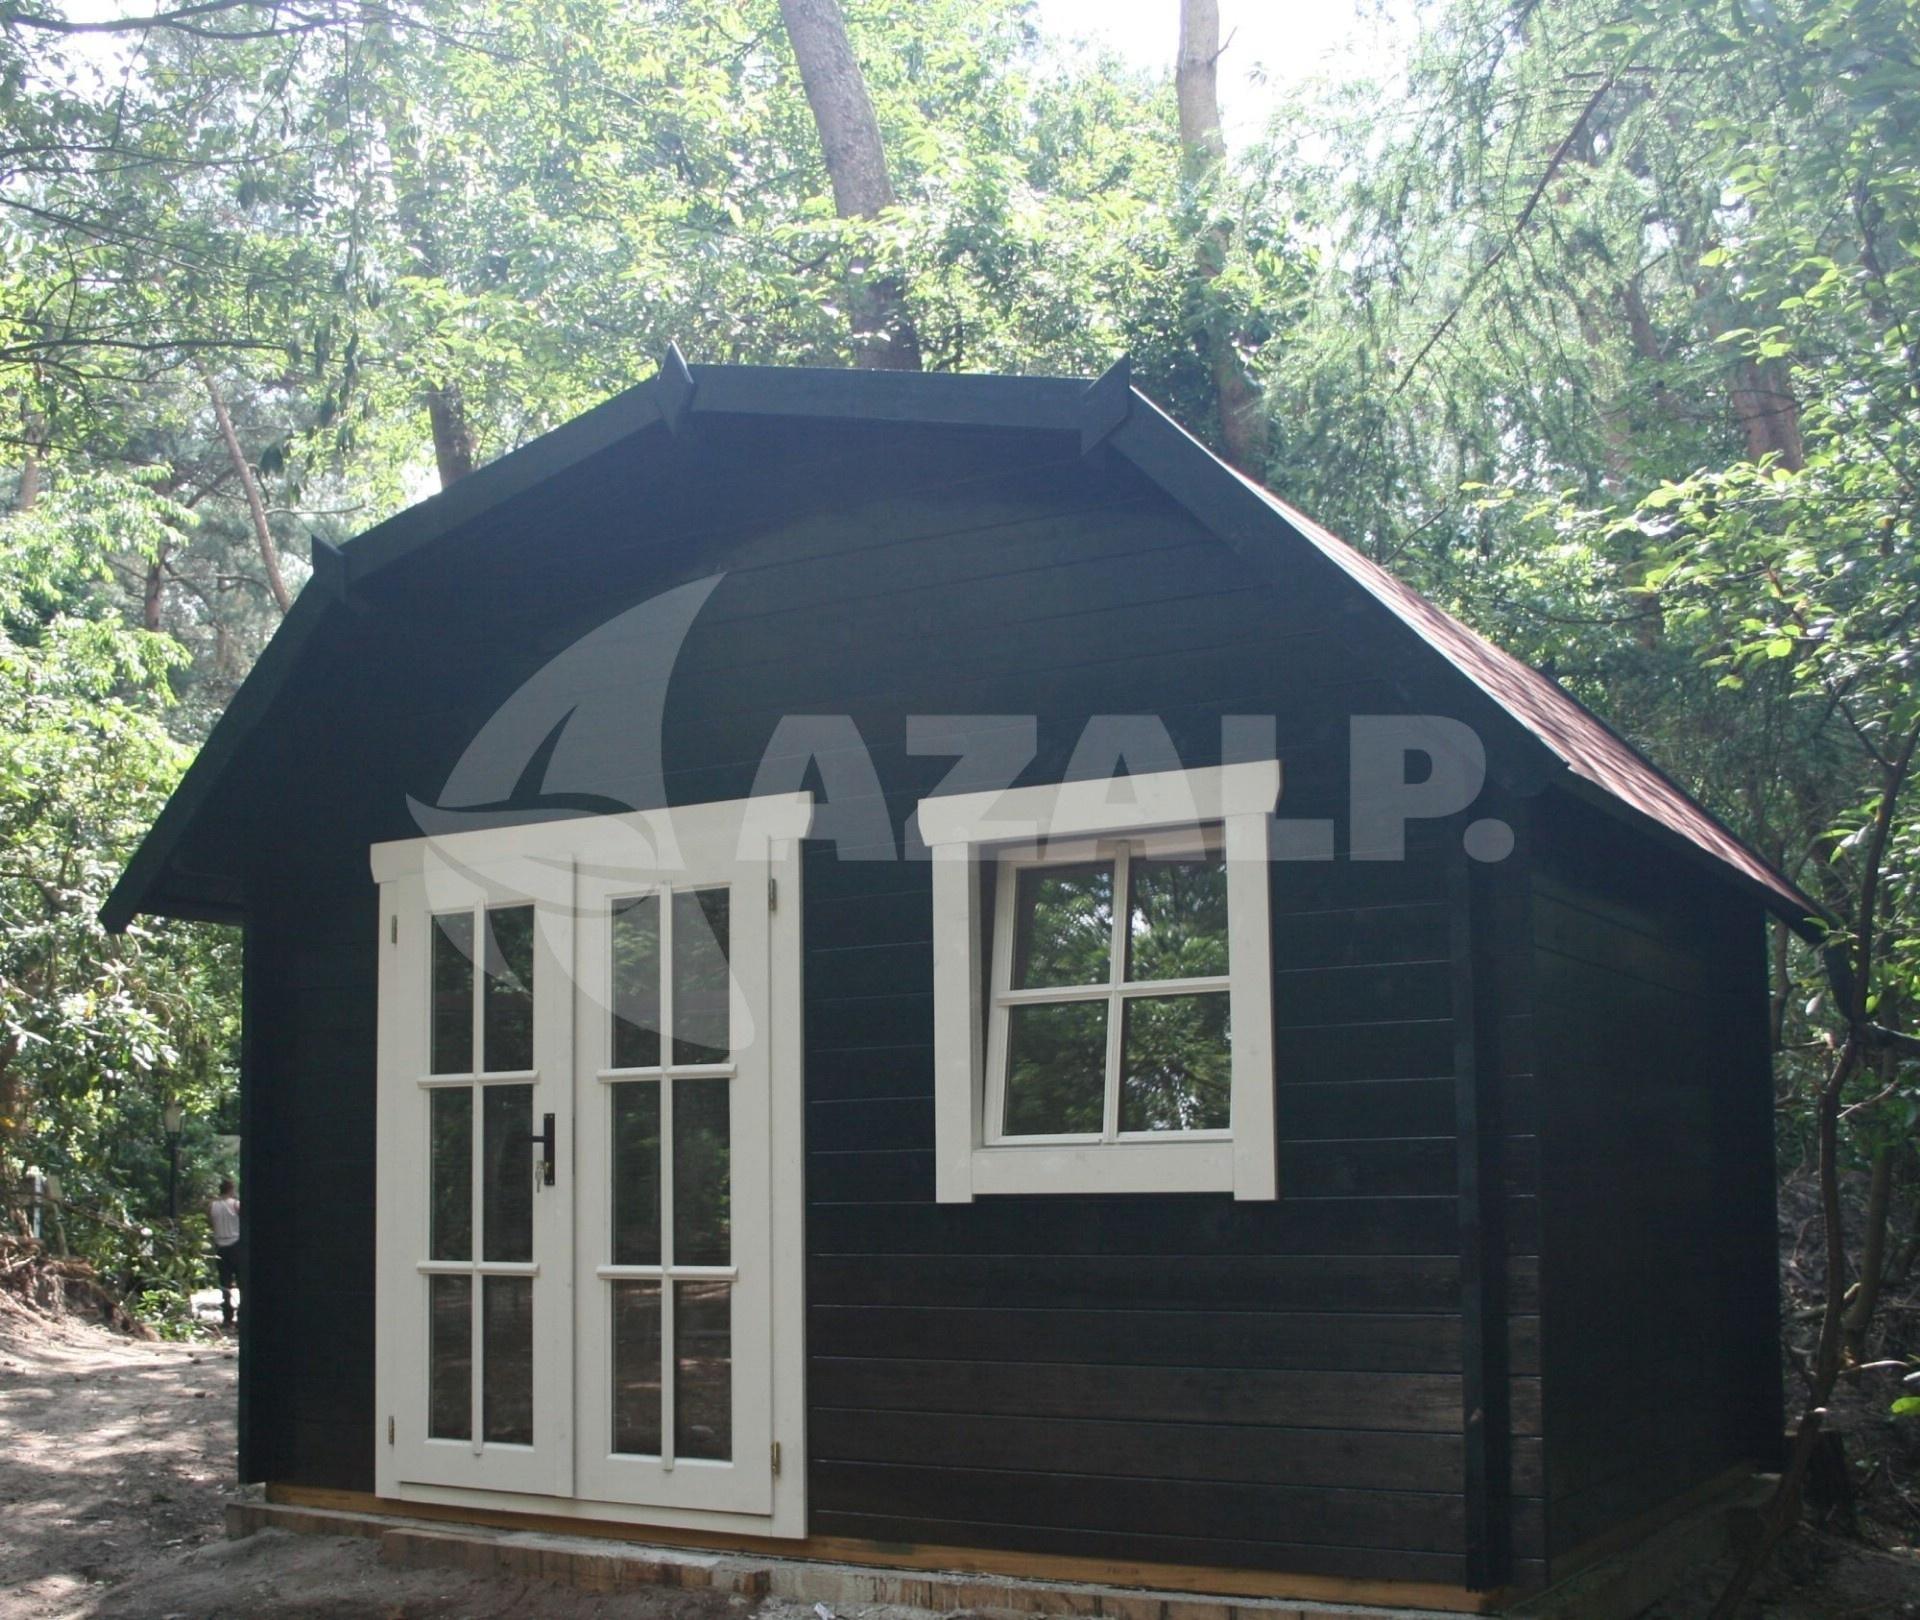 koopmans garant sb dunkelbraun 210 2 5l kaufen bei. Black Bedroom Furniture Sets. Home Design Ideas